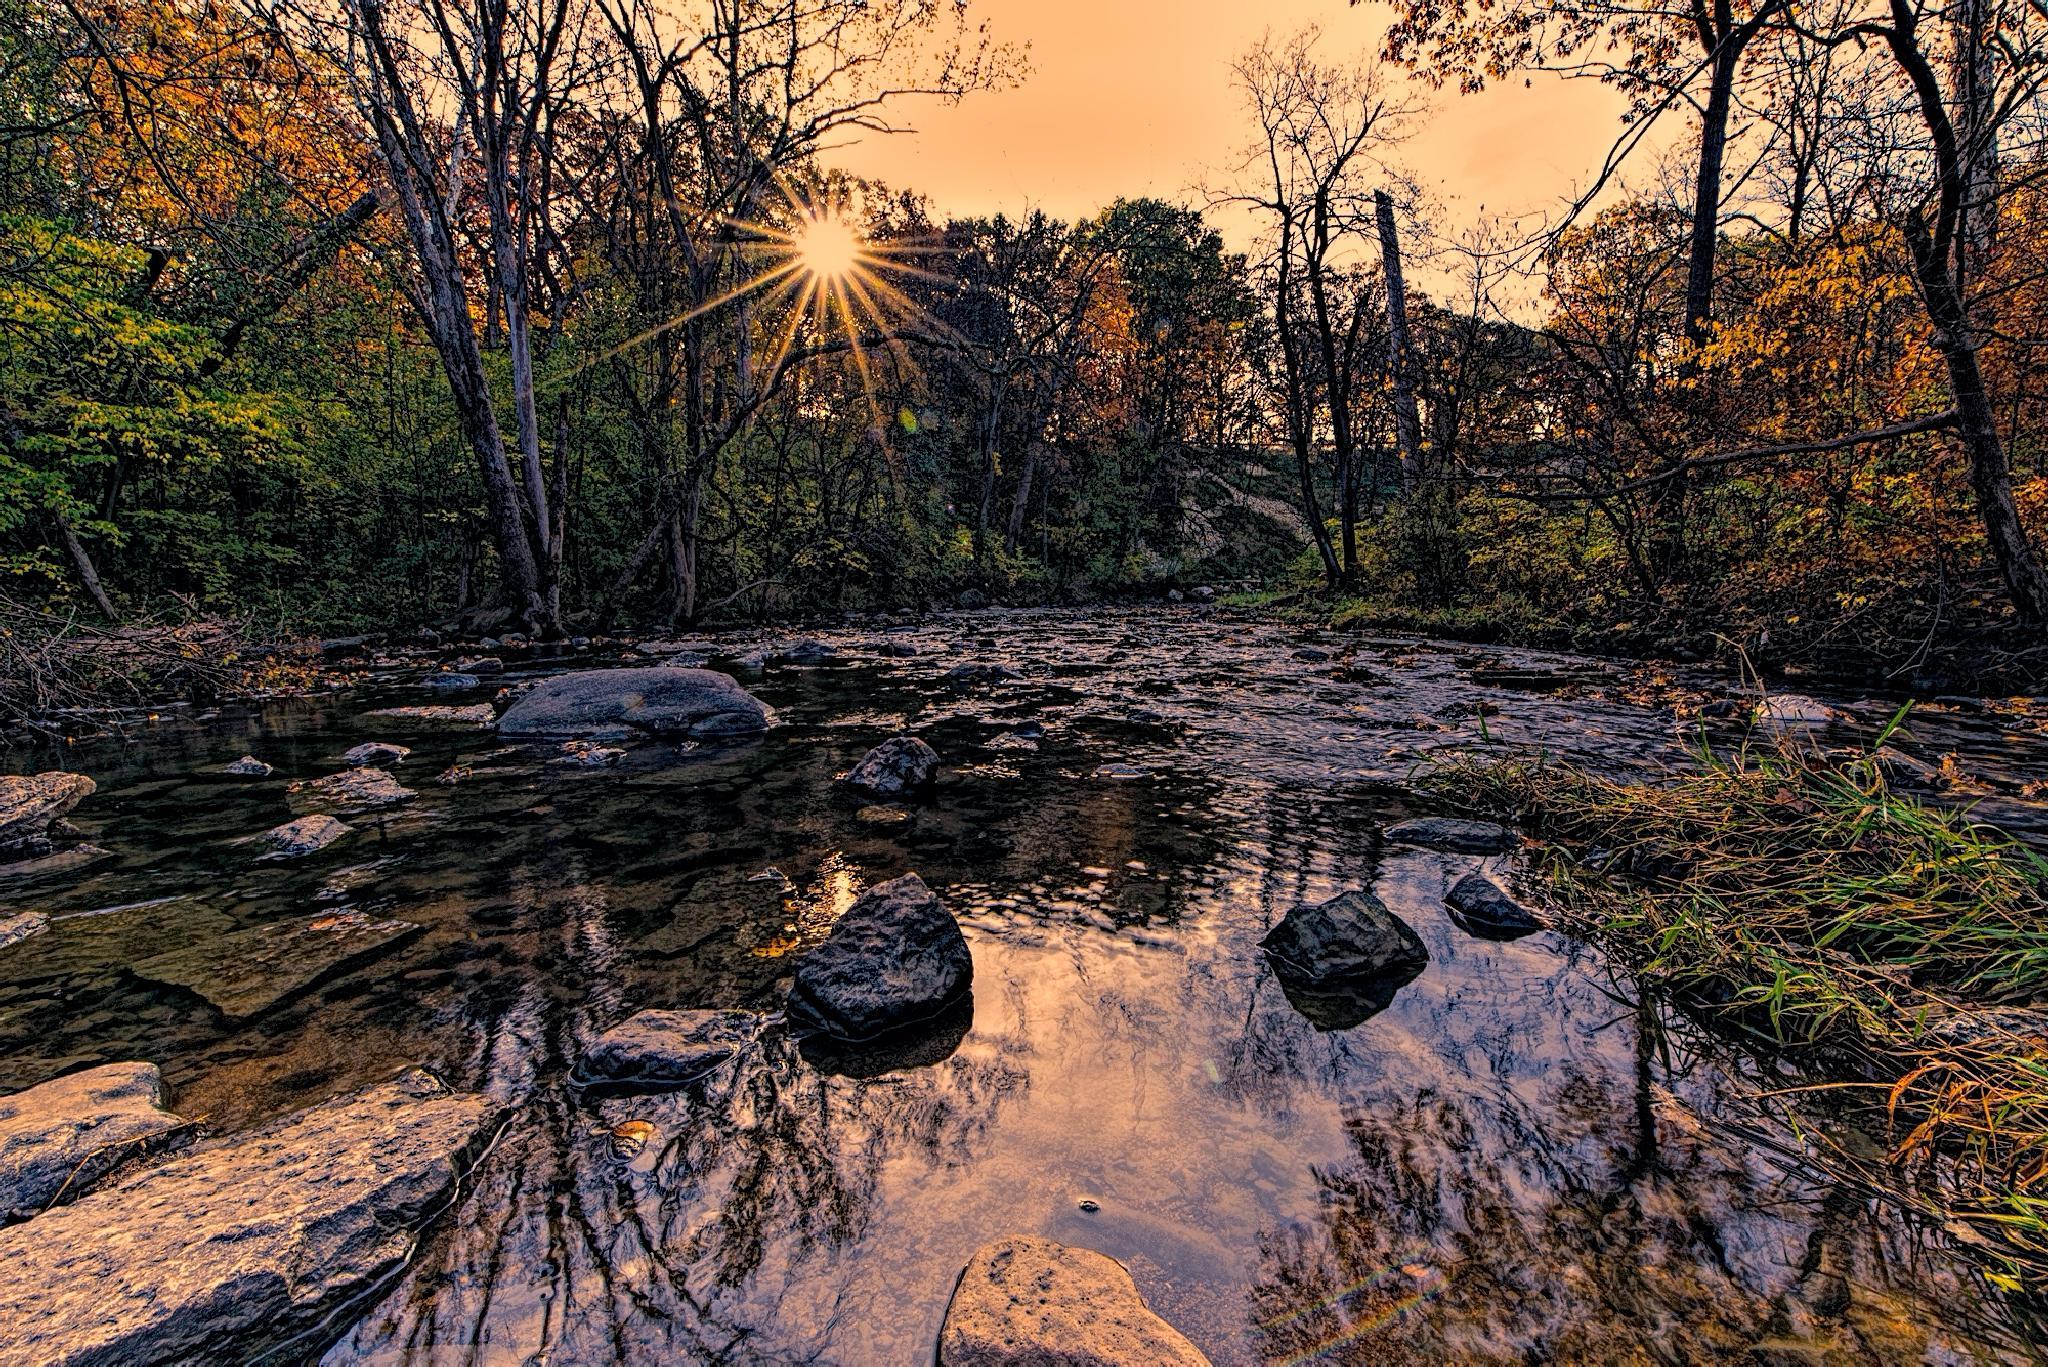 Sunrise Serenity by David Neesley